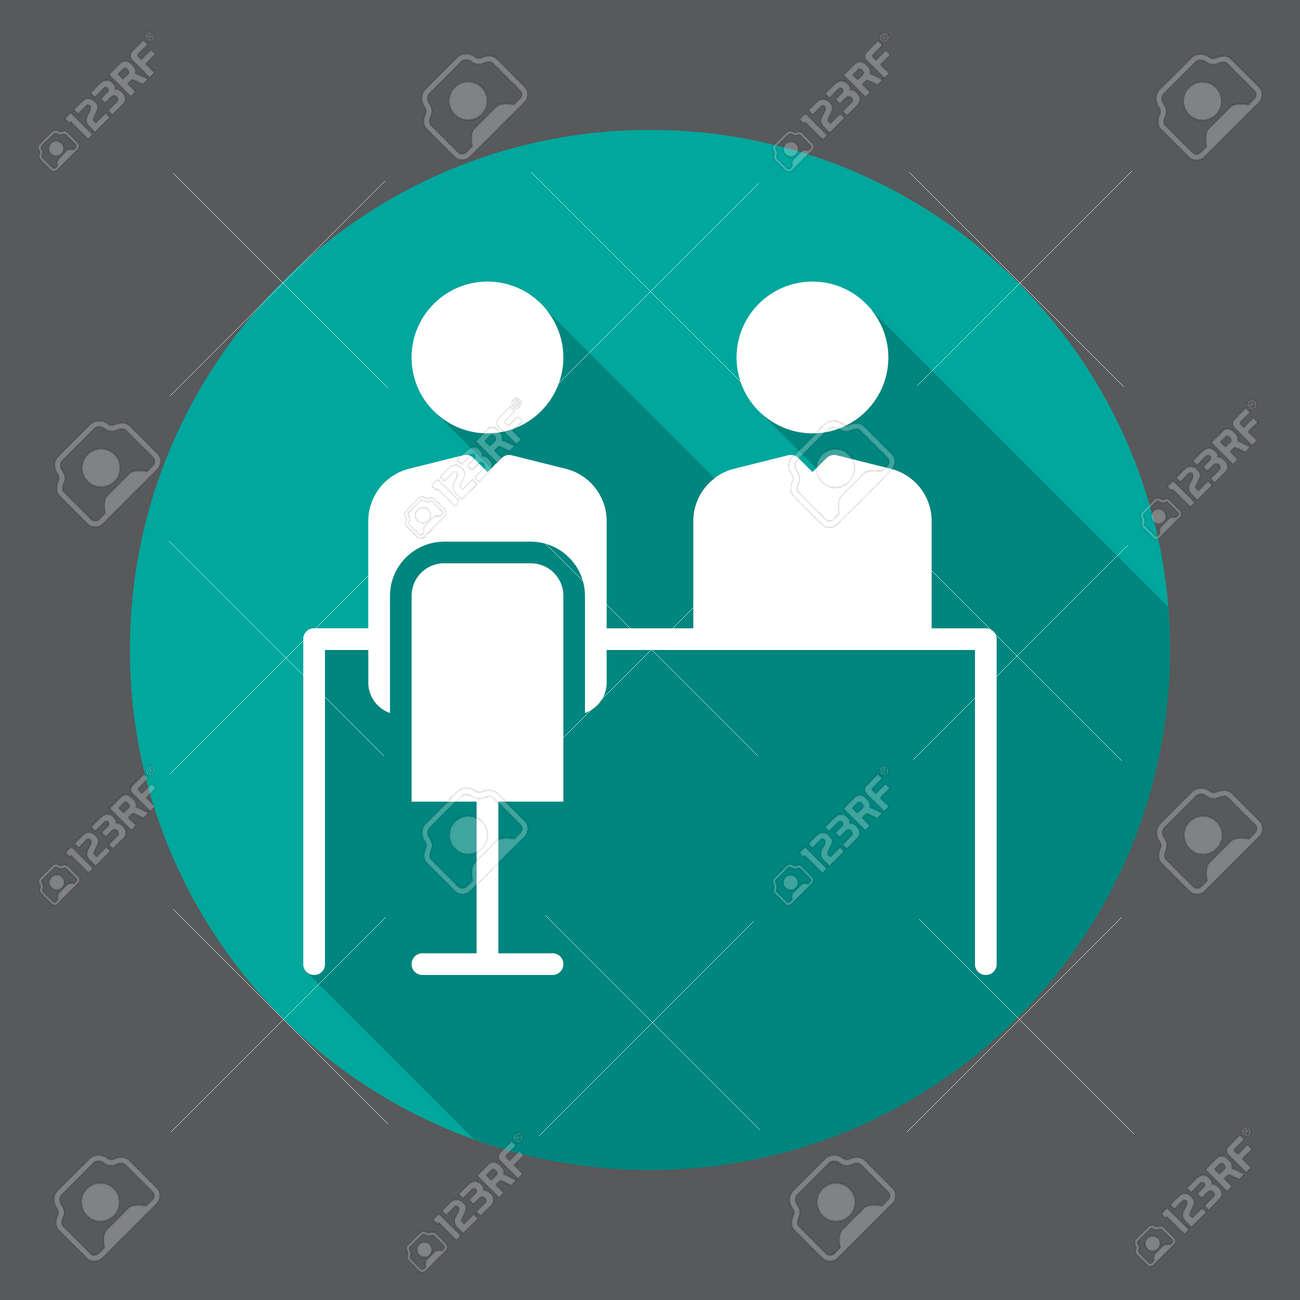 Job interview flat icon  Round colorful button, circular vector